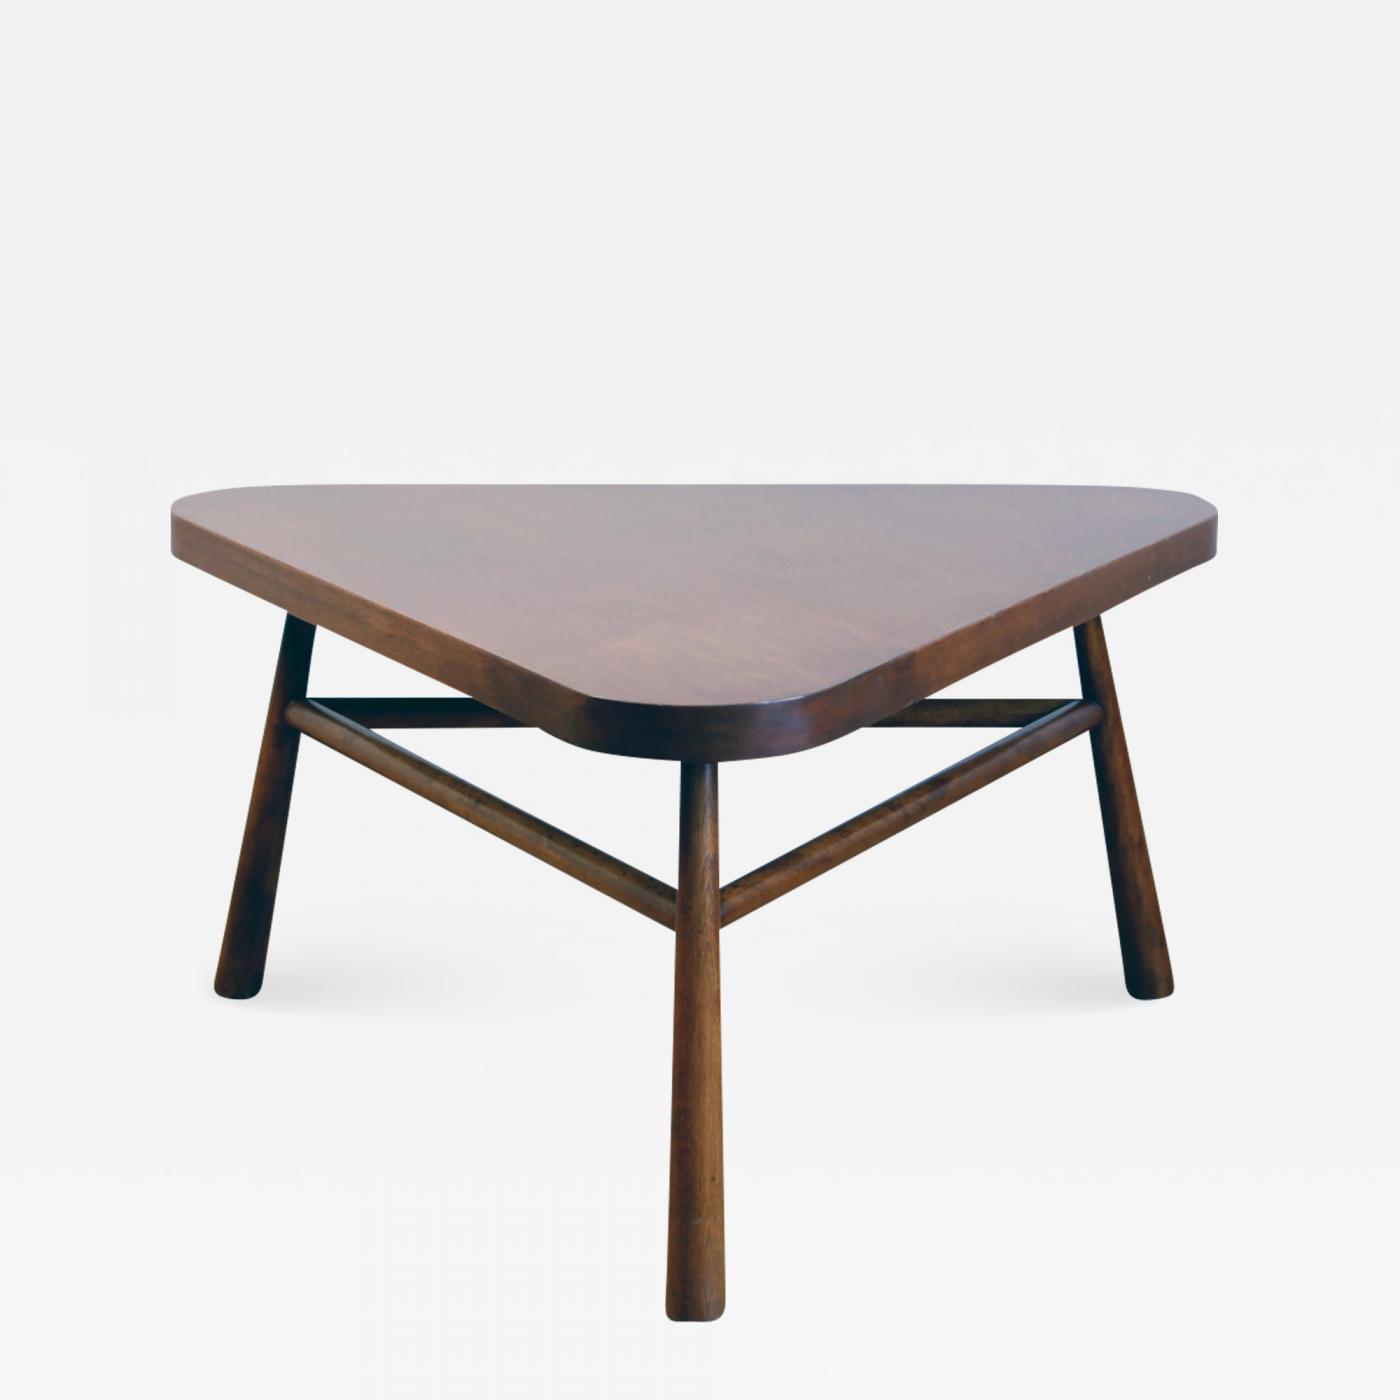 - Triangular Coffee Table By TH Robsjohn-Gibbings For Widdicomb